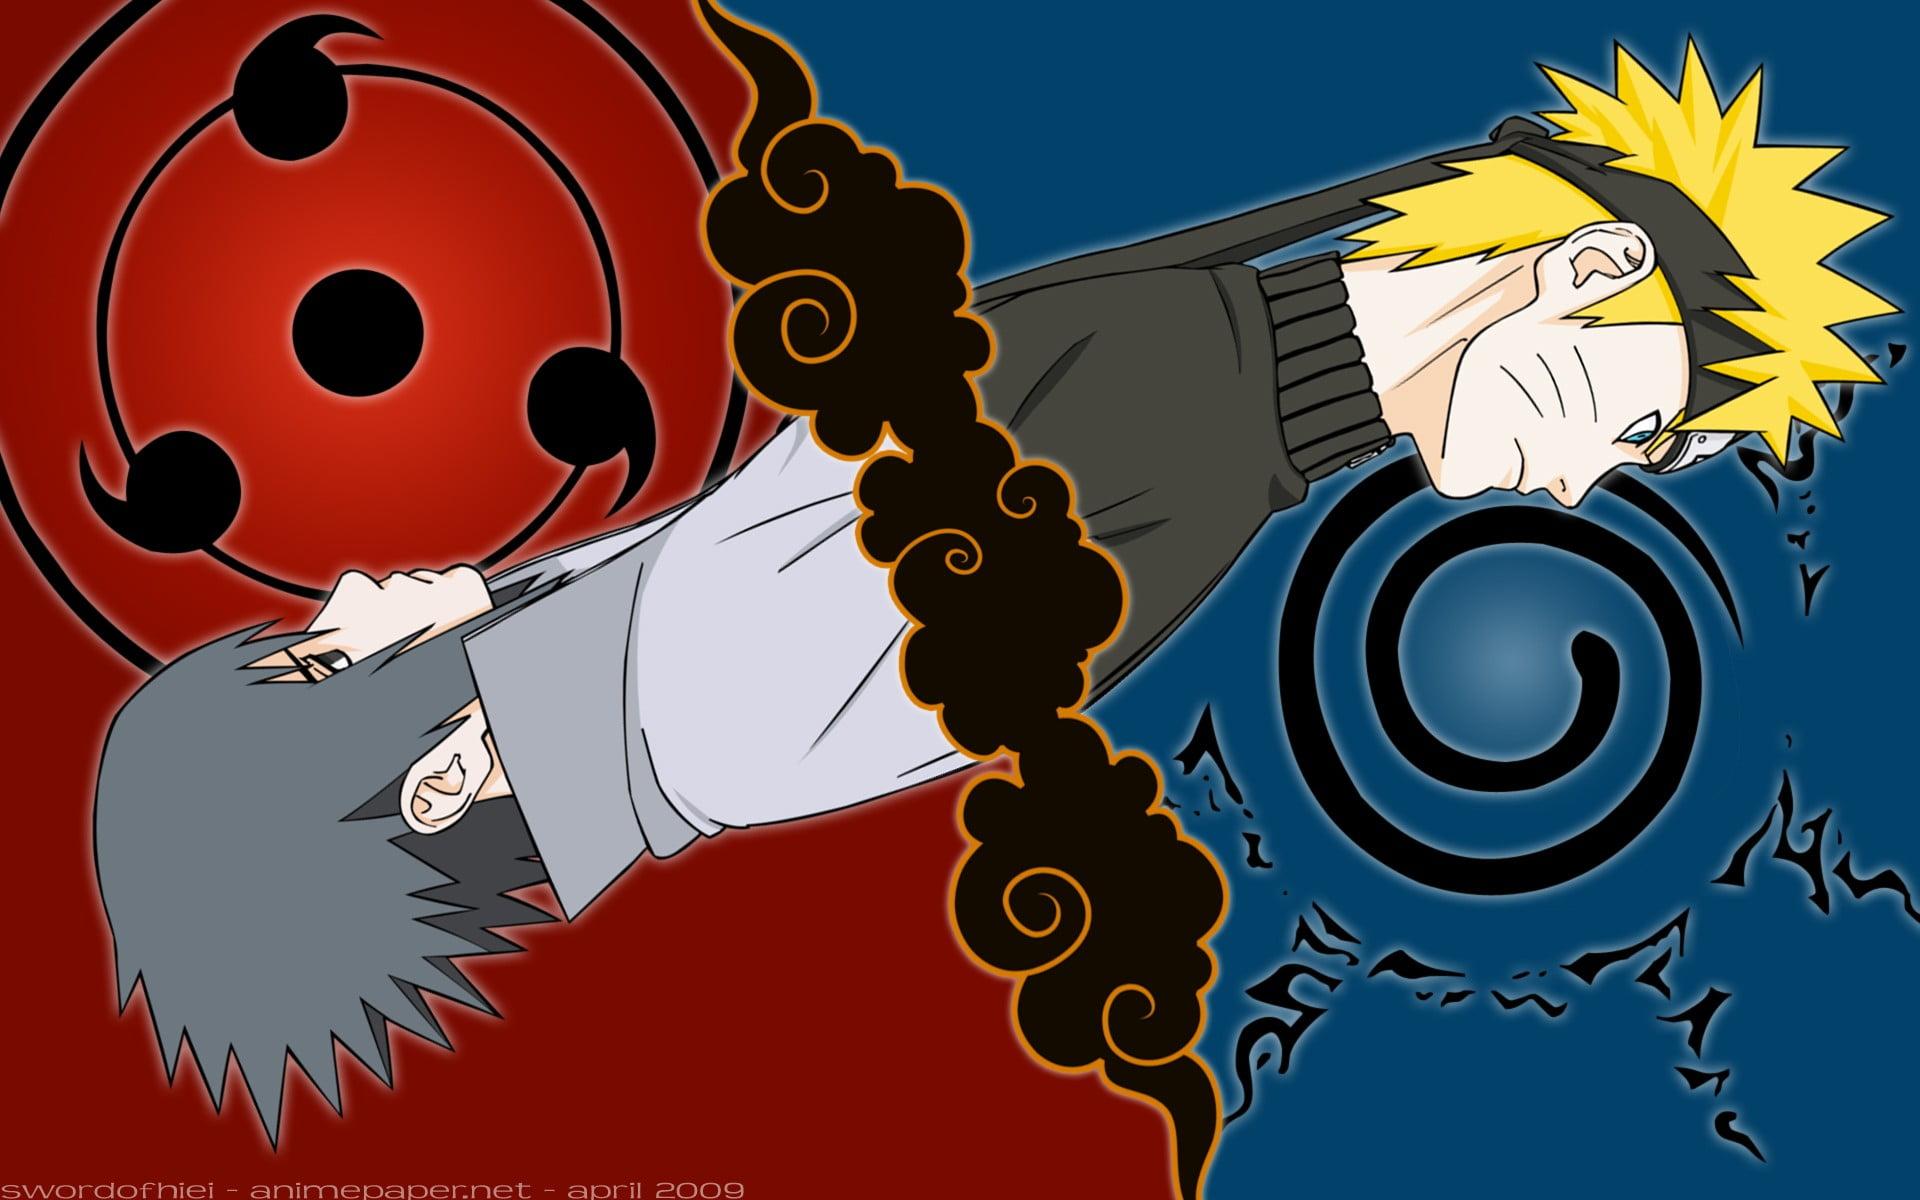 Naruto Wallpaper Hd - HD Wallpaper